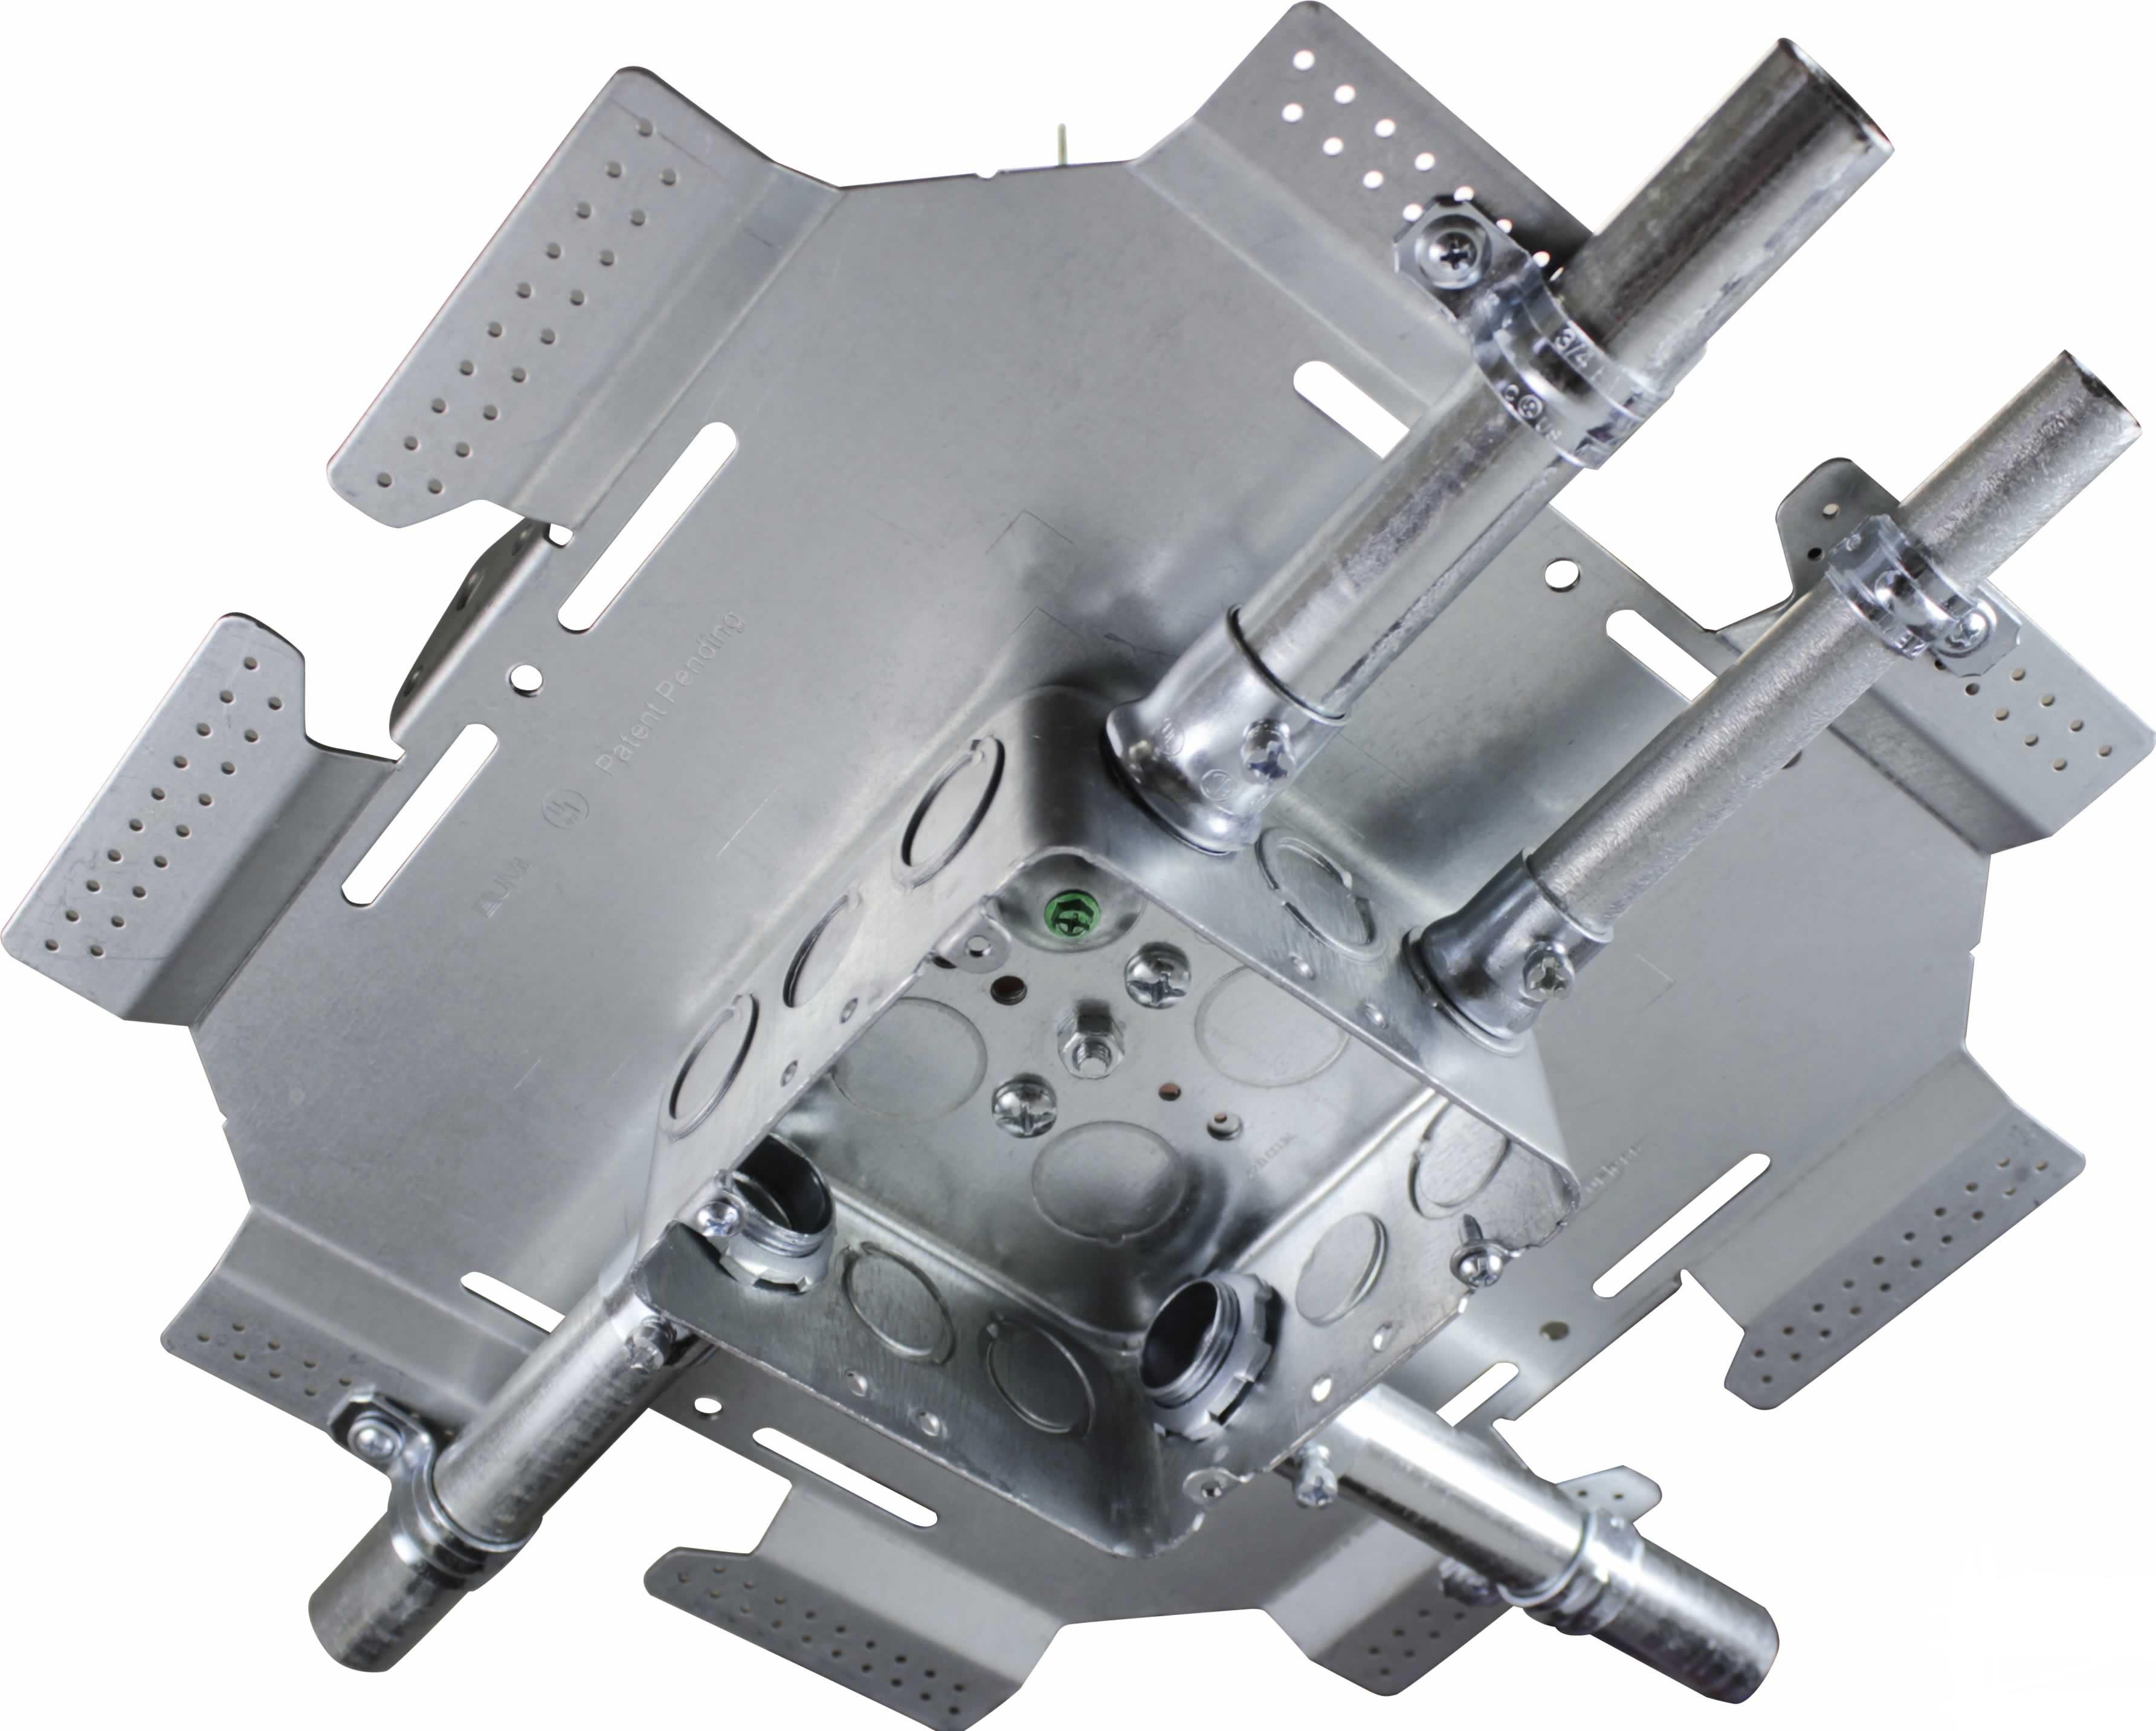 D5SDB-CKO-S installed on BCHS